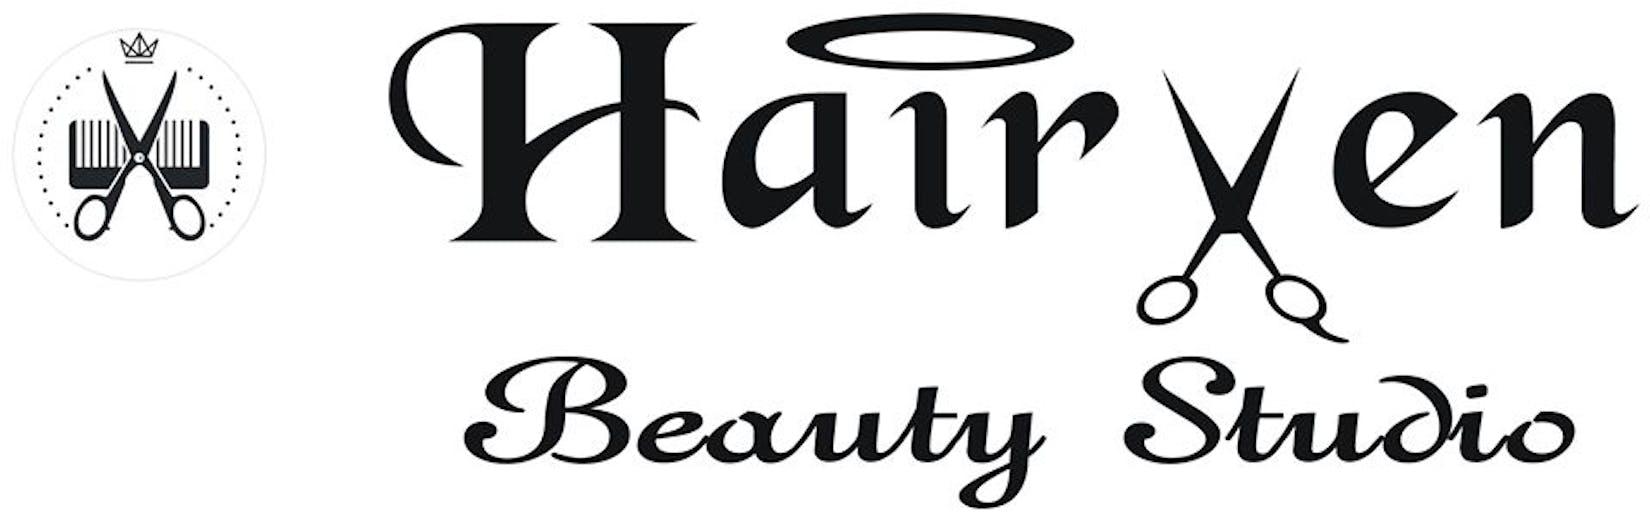 Hairven Beauty Studio | Beauty